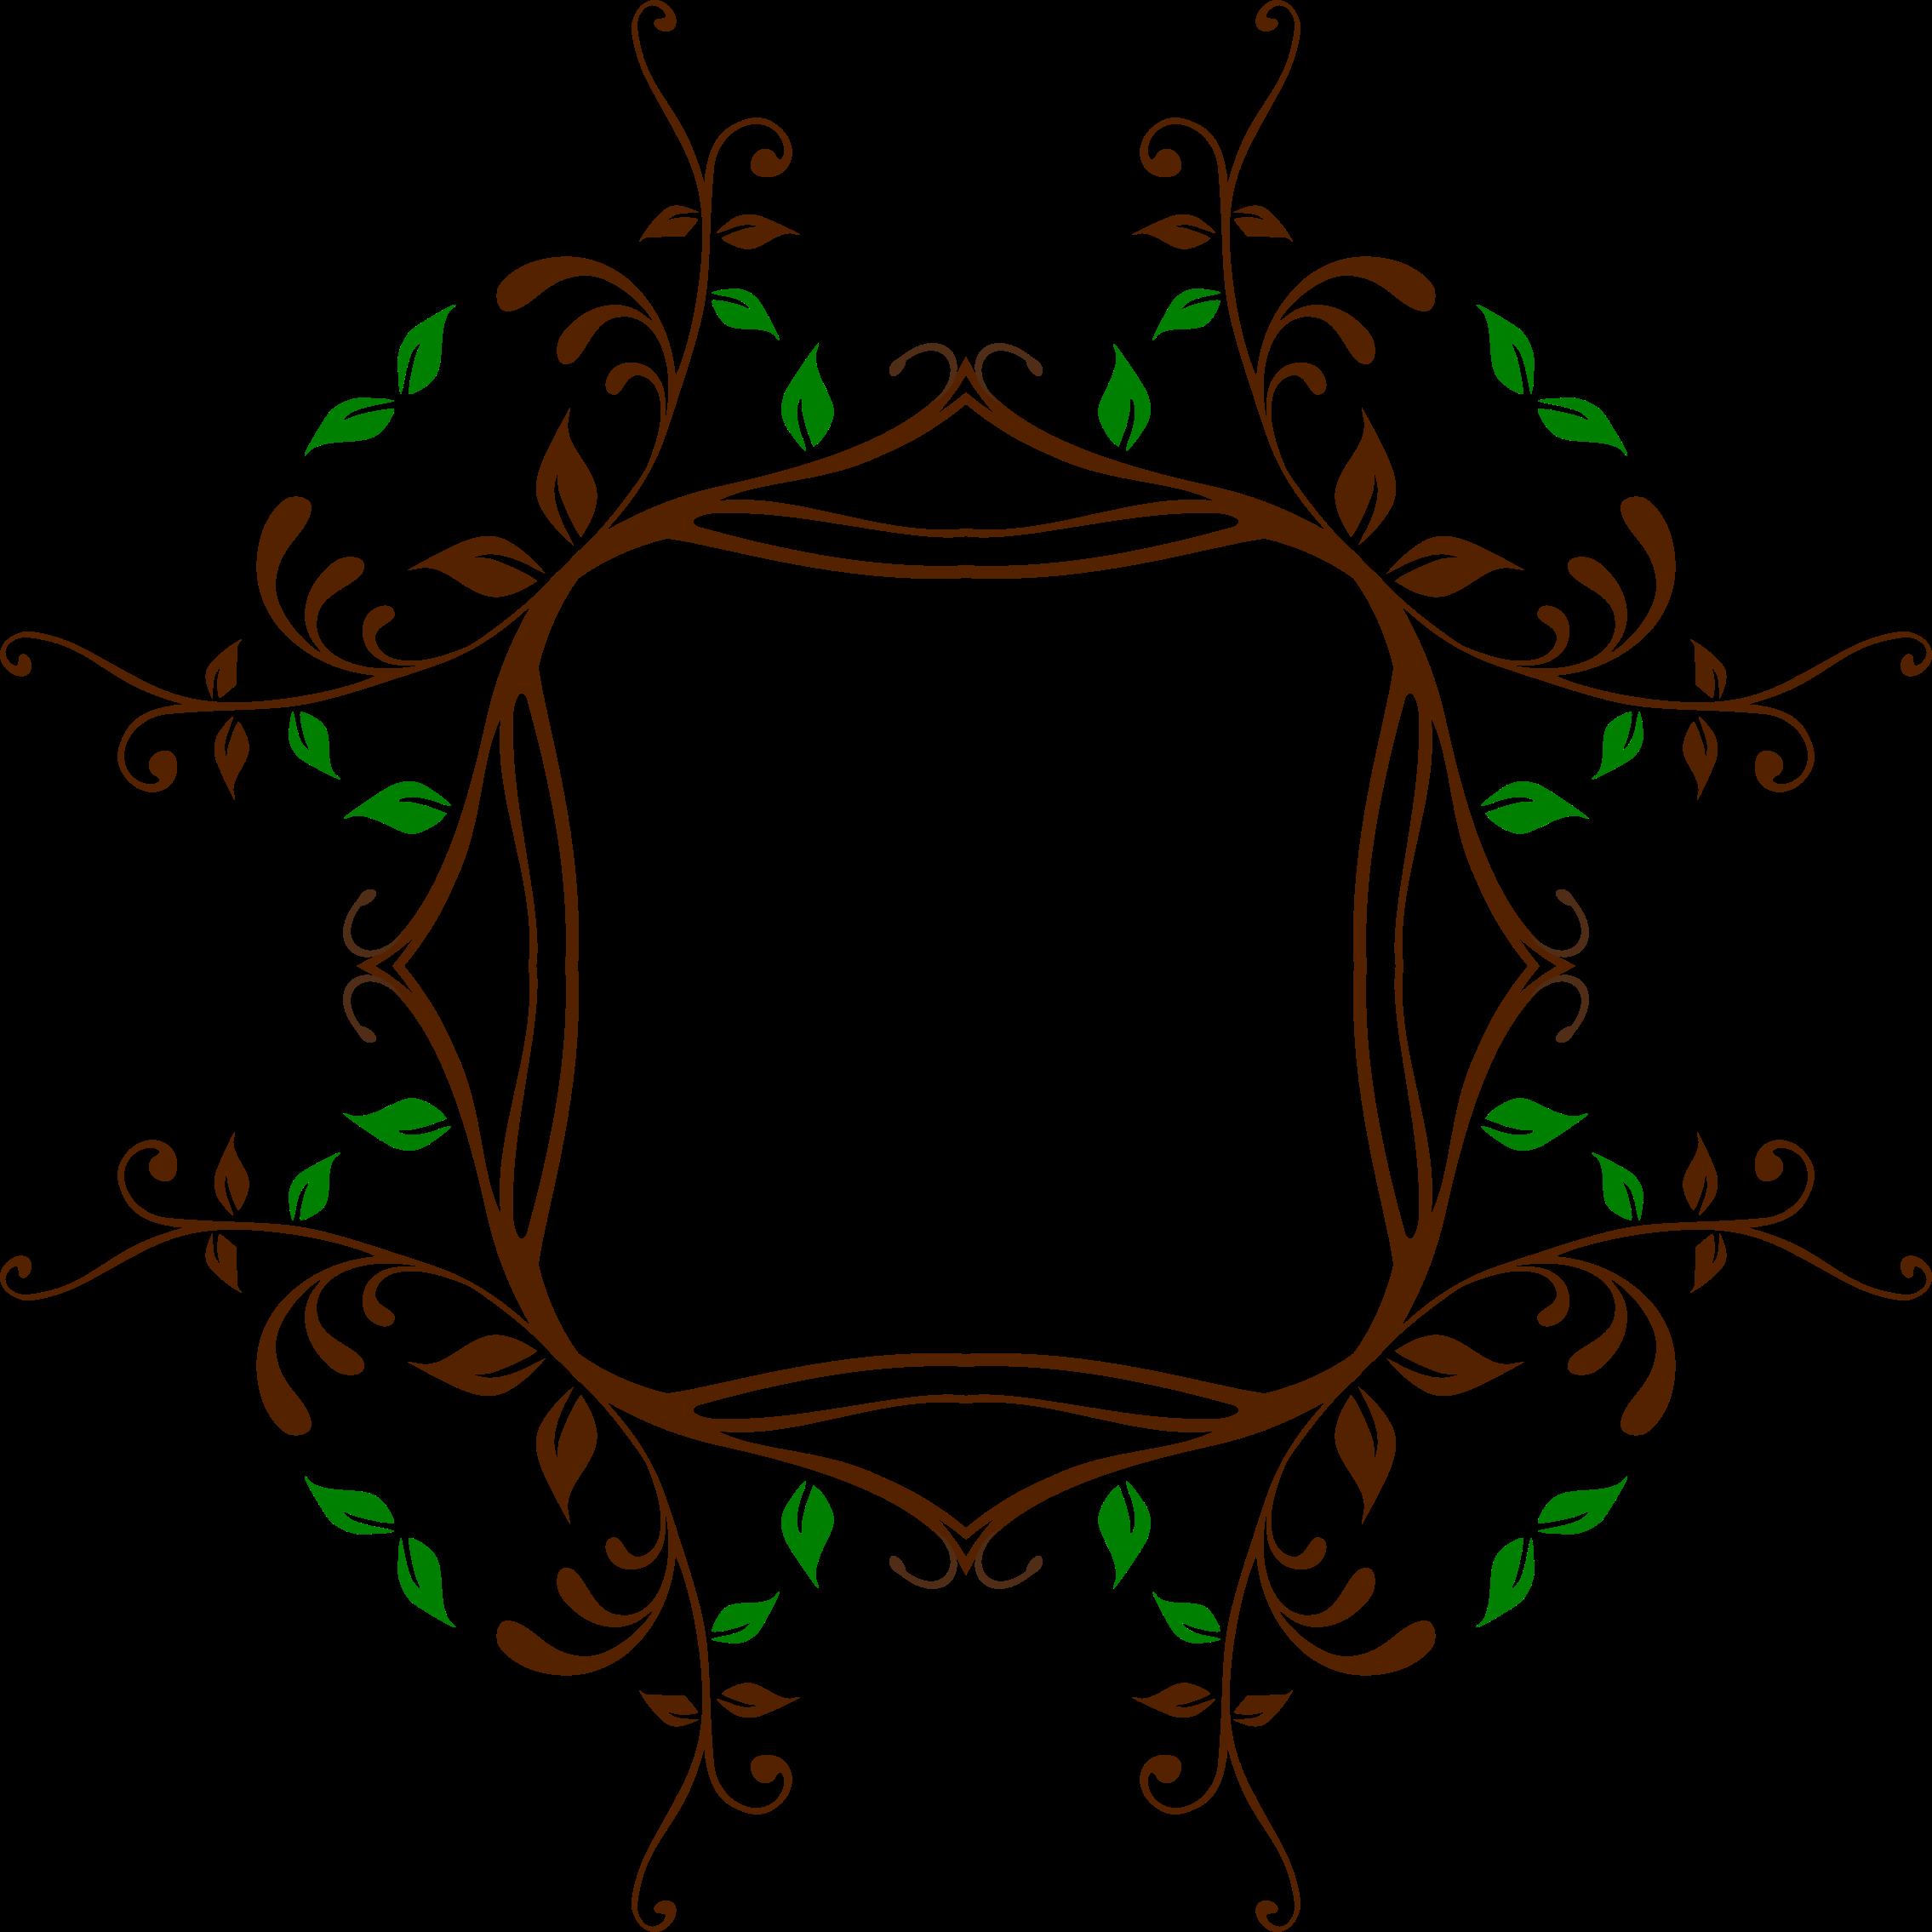 Circle clipart vine. Leafy frame big image